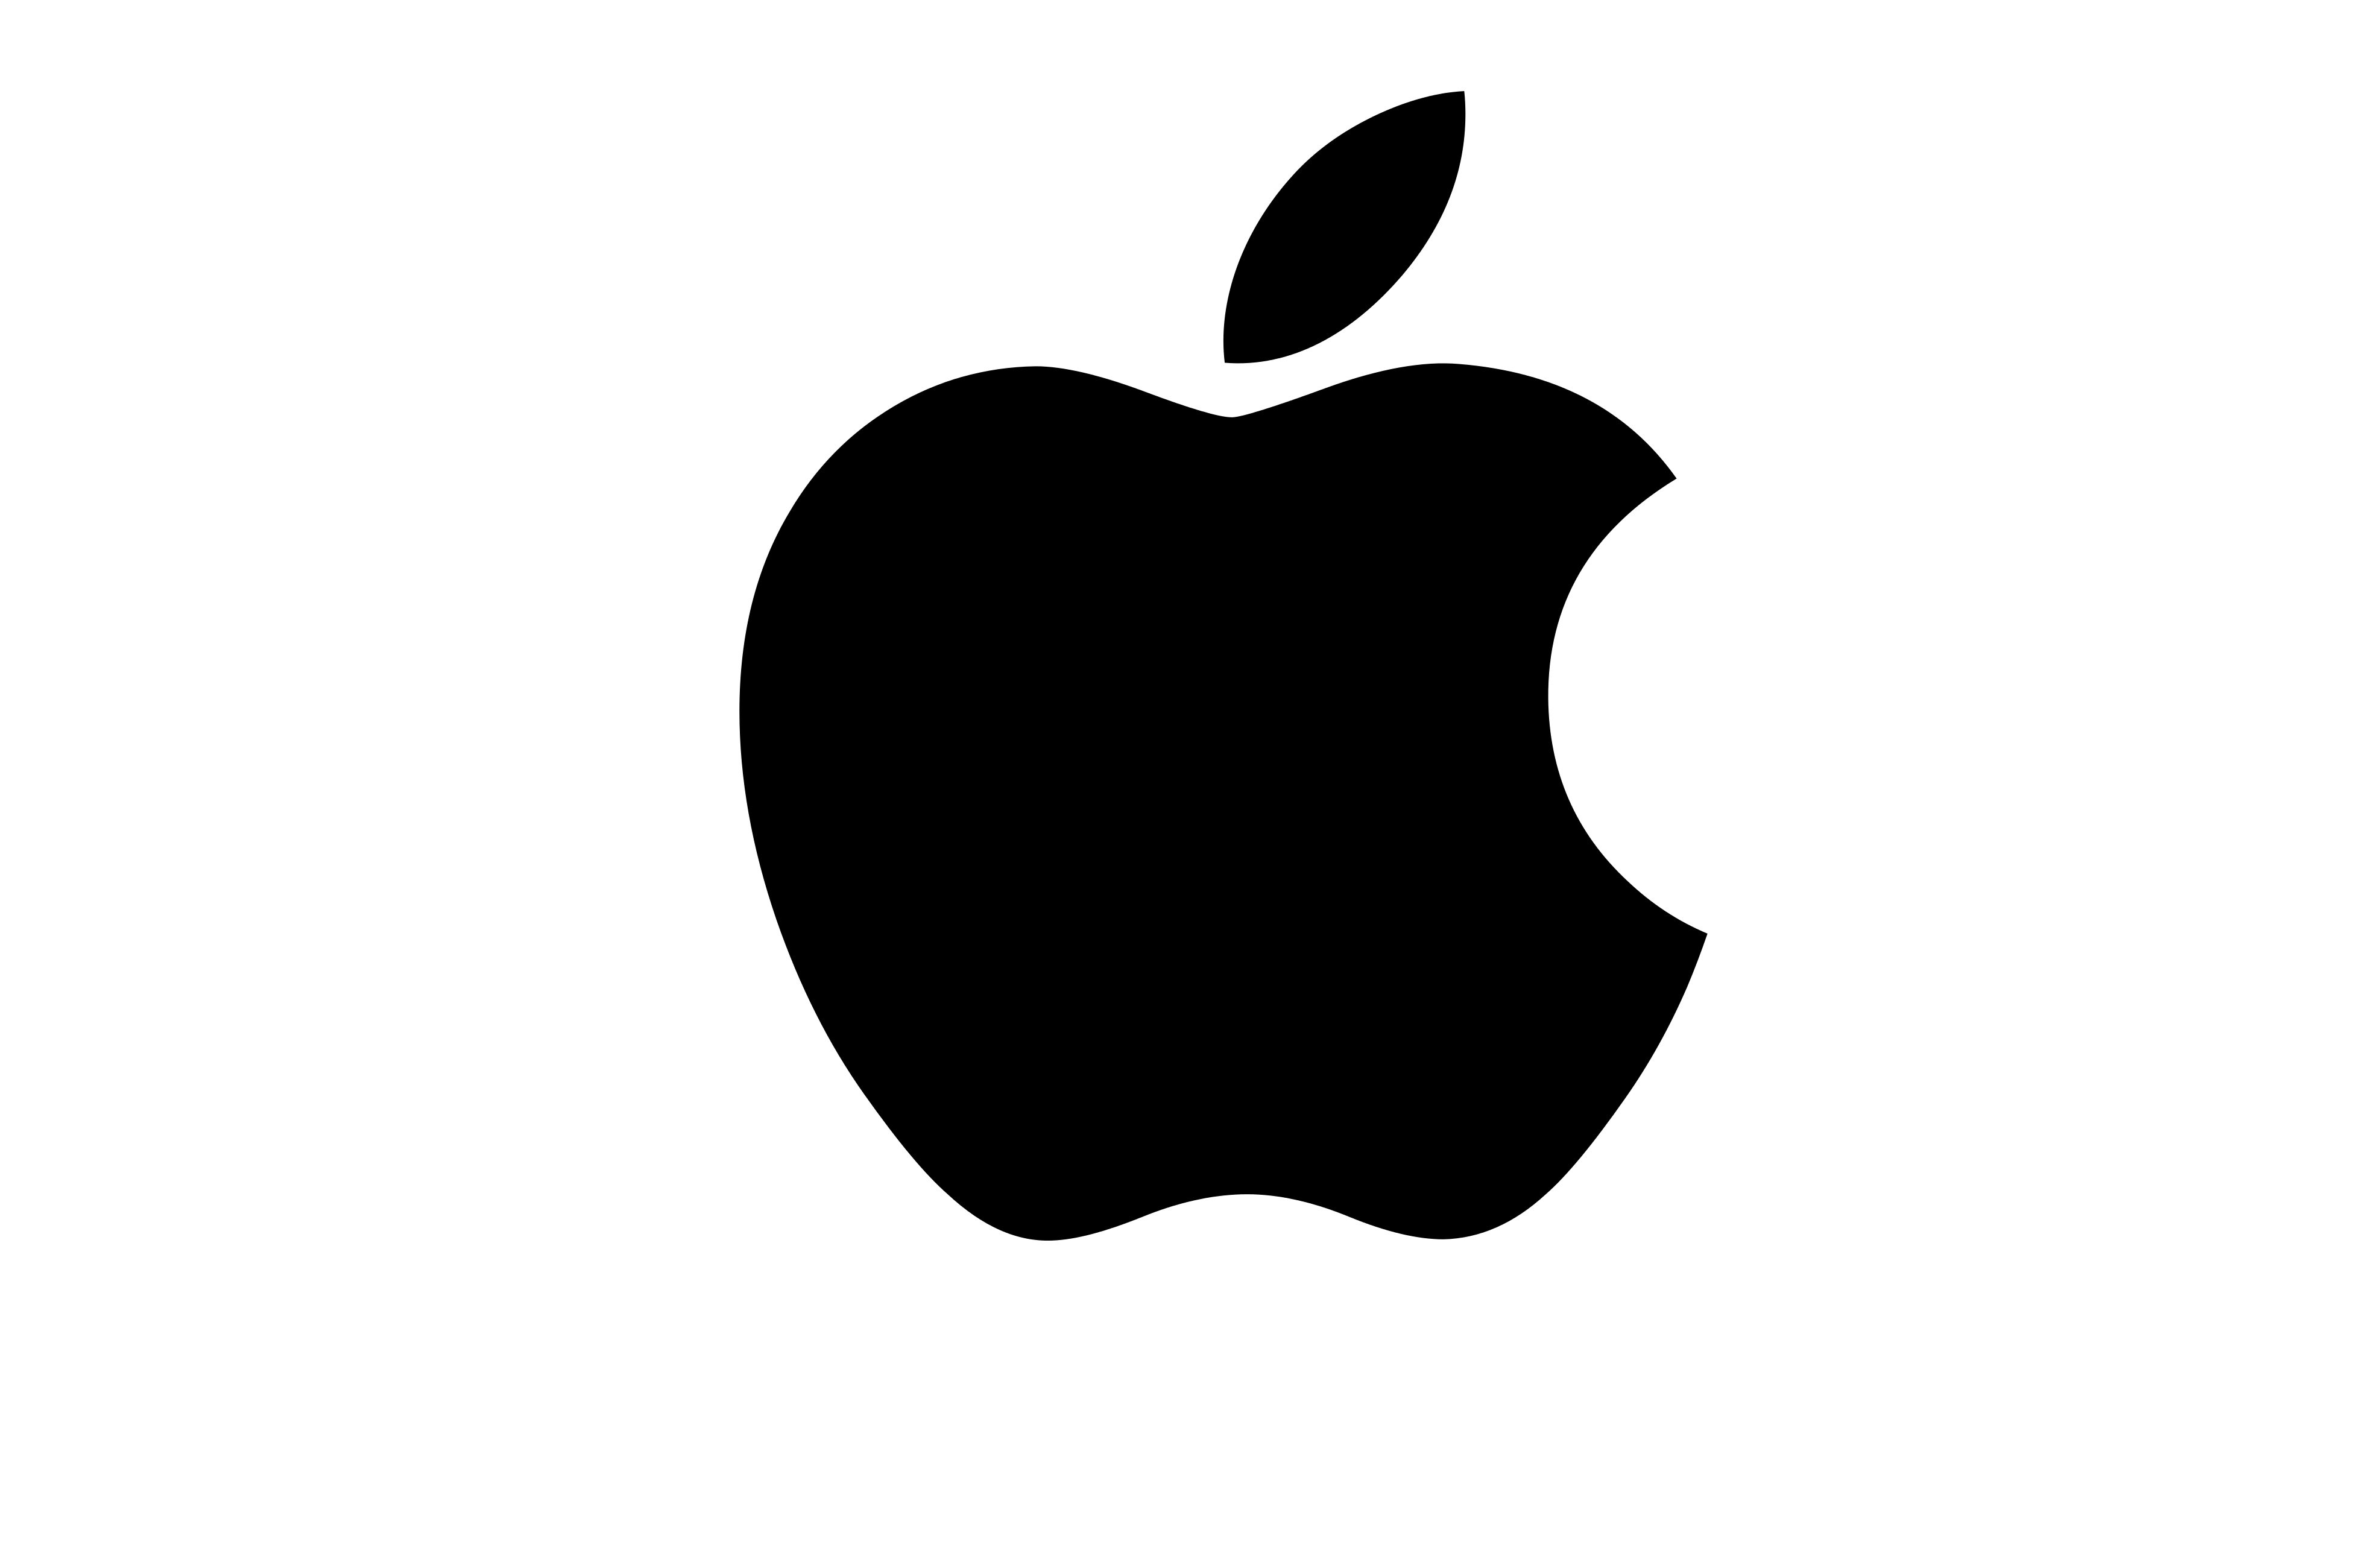 Logo clipart apple, Logo apple Transparent FREE for download.